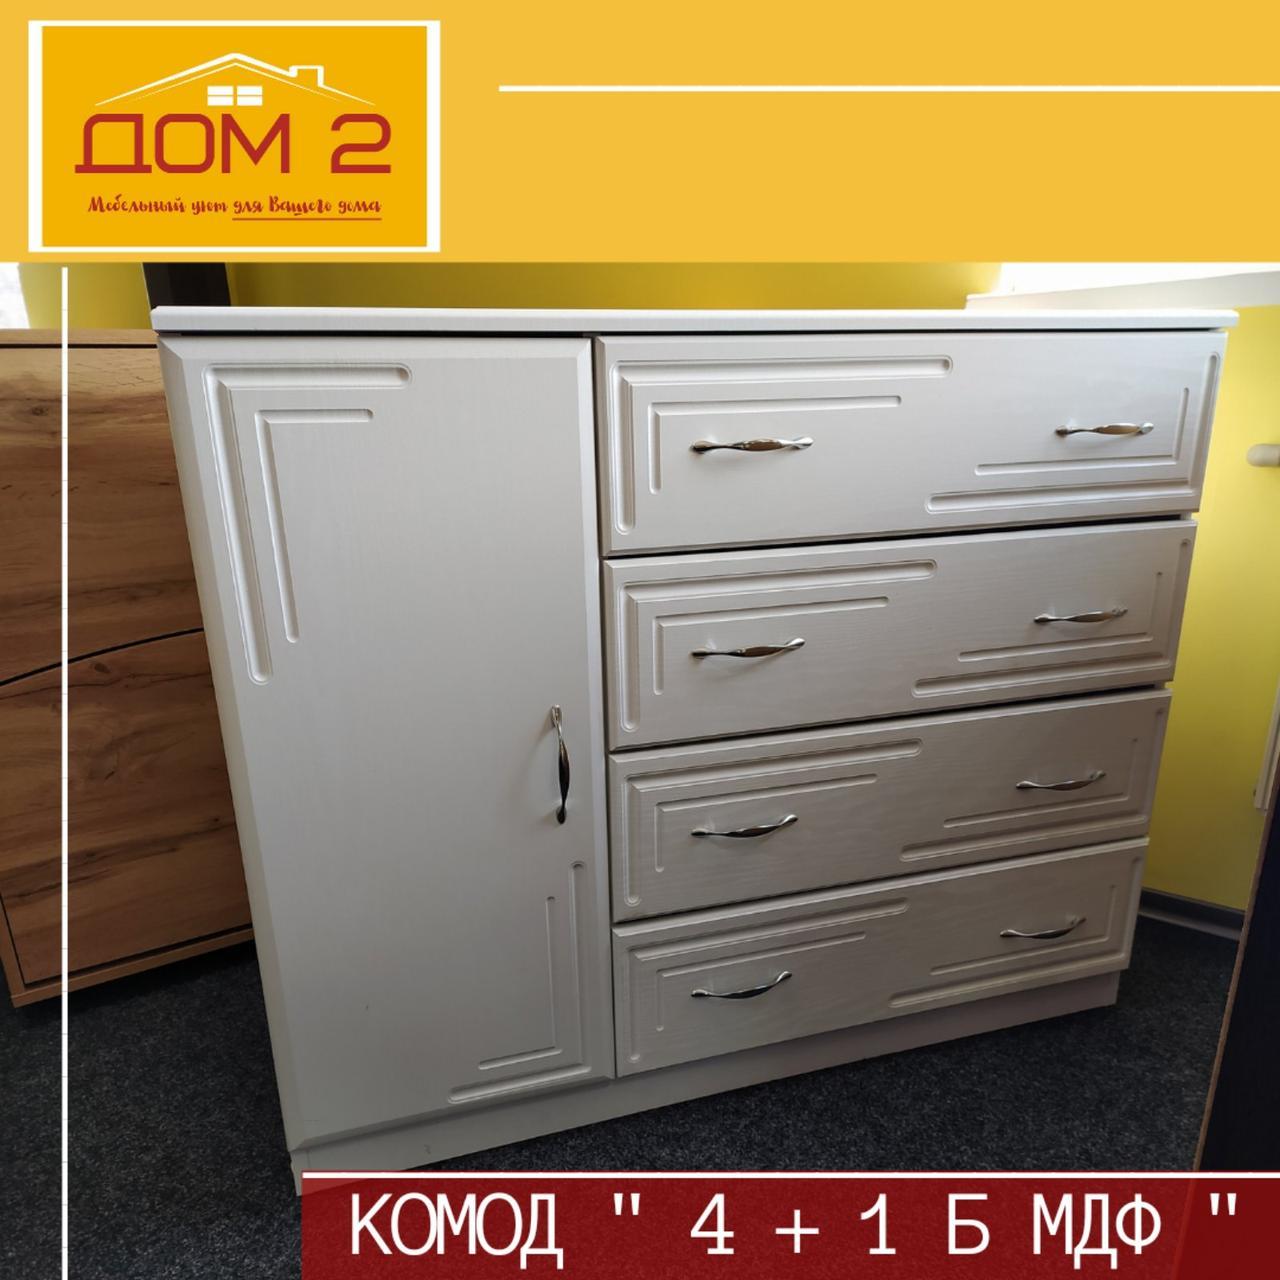 Комод 4+1Б МДФ